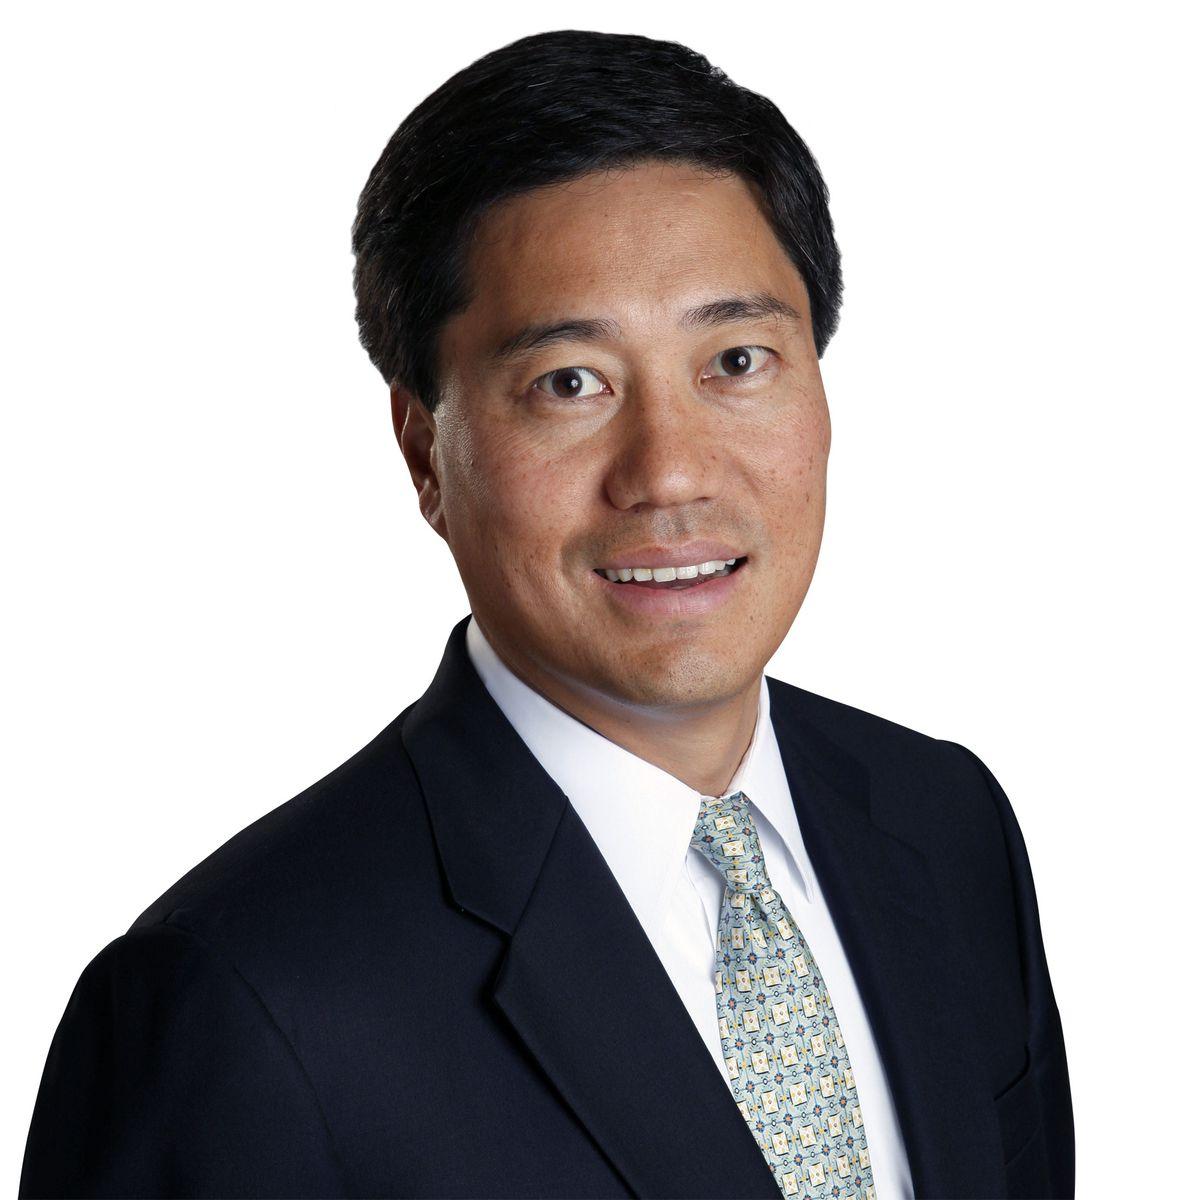 Neslon Chai, Uber's new CFO